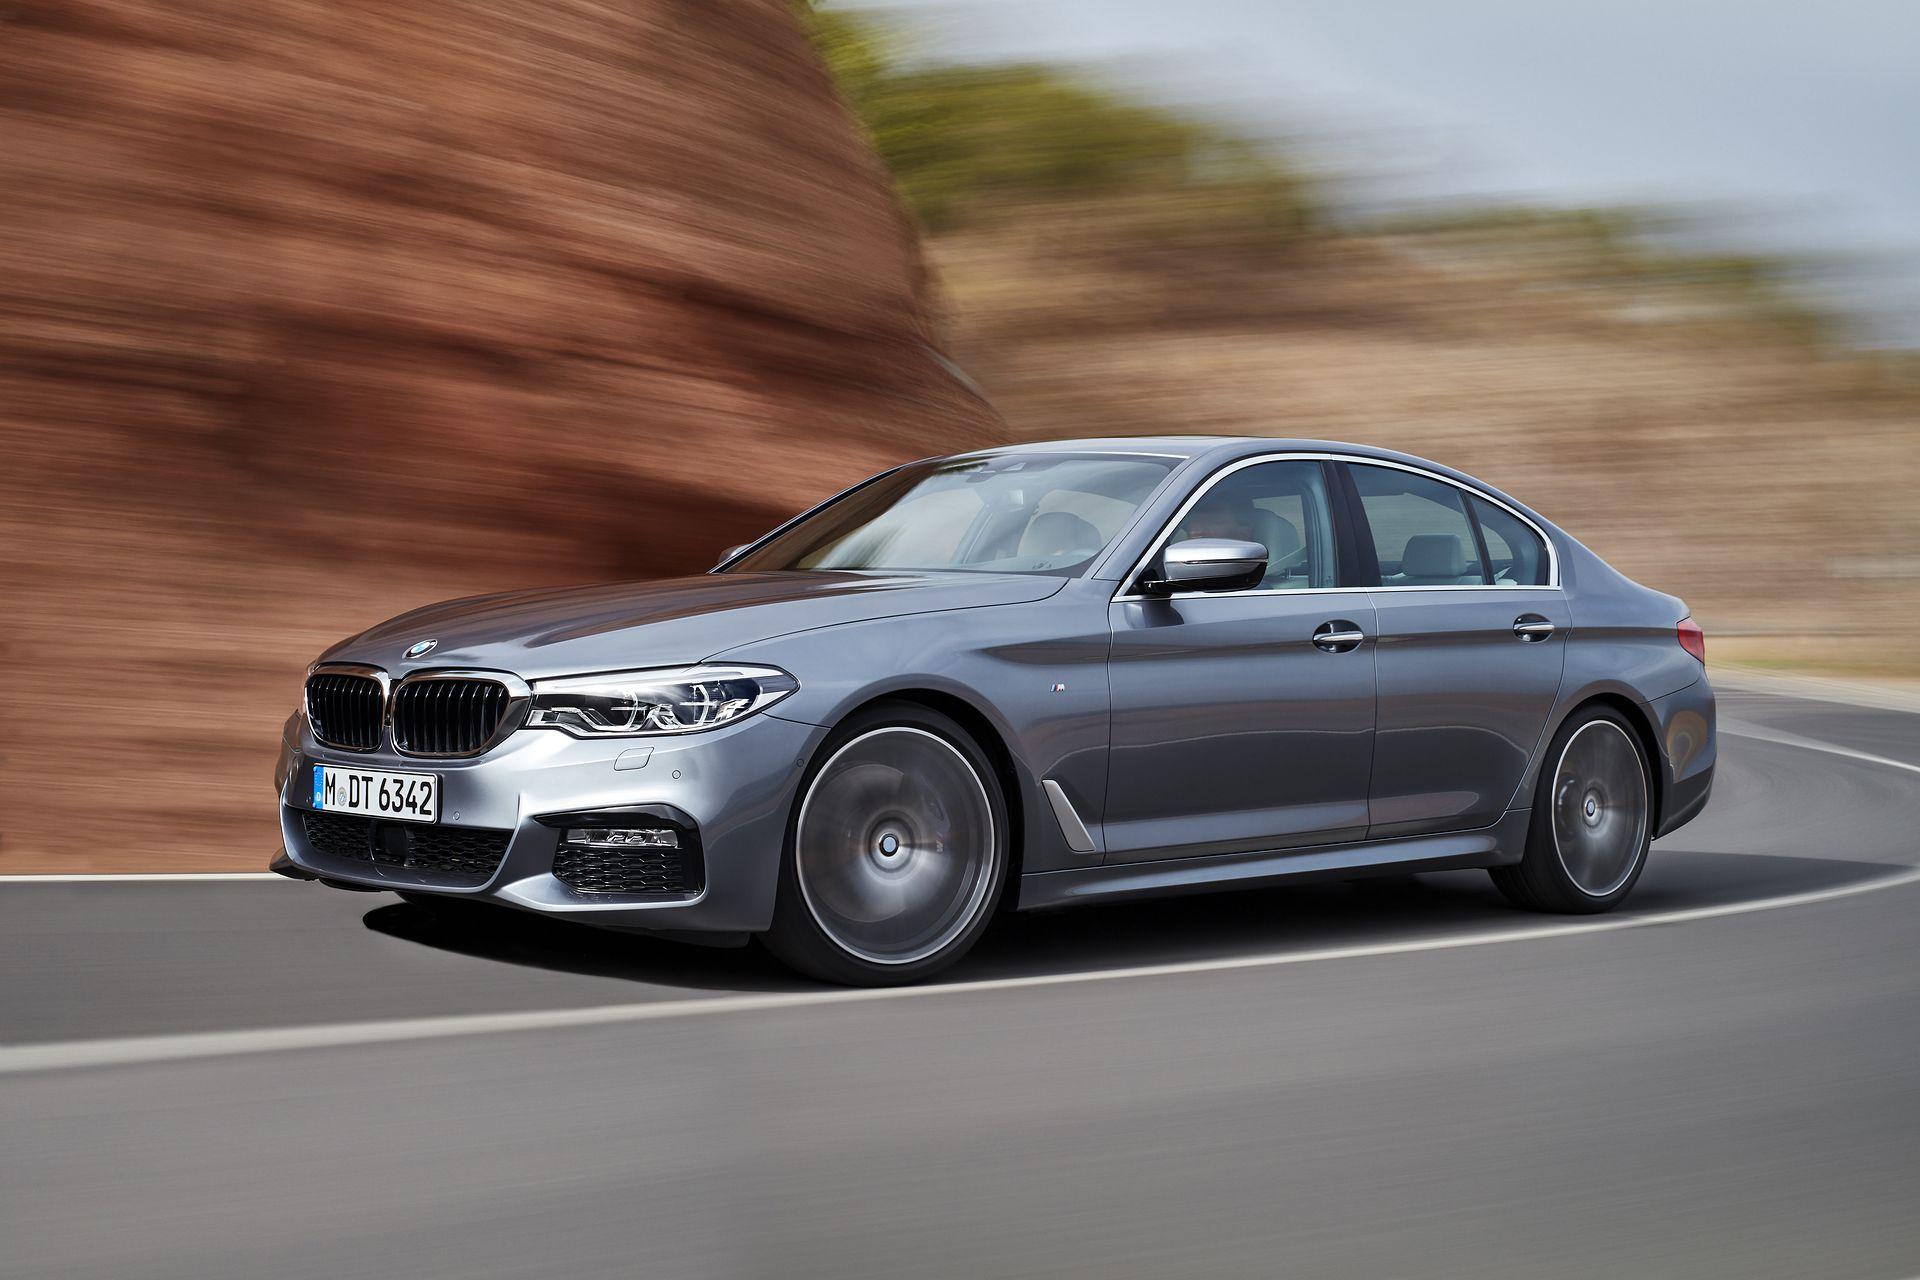 Nowe BMW Serii 5 (G30) premiera | Autokult.pl